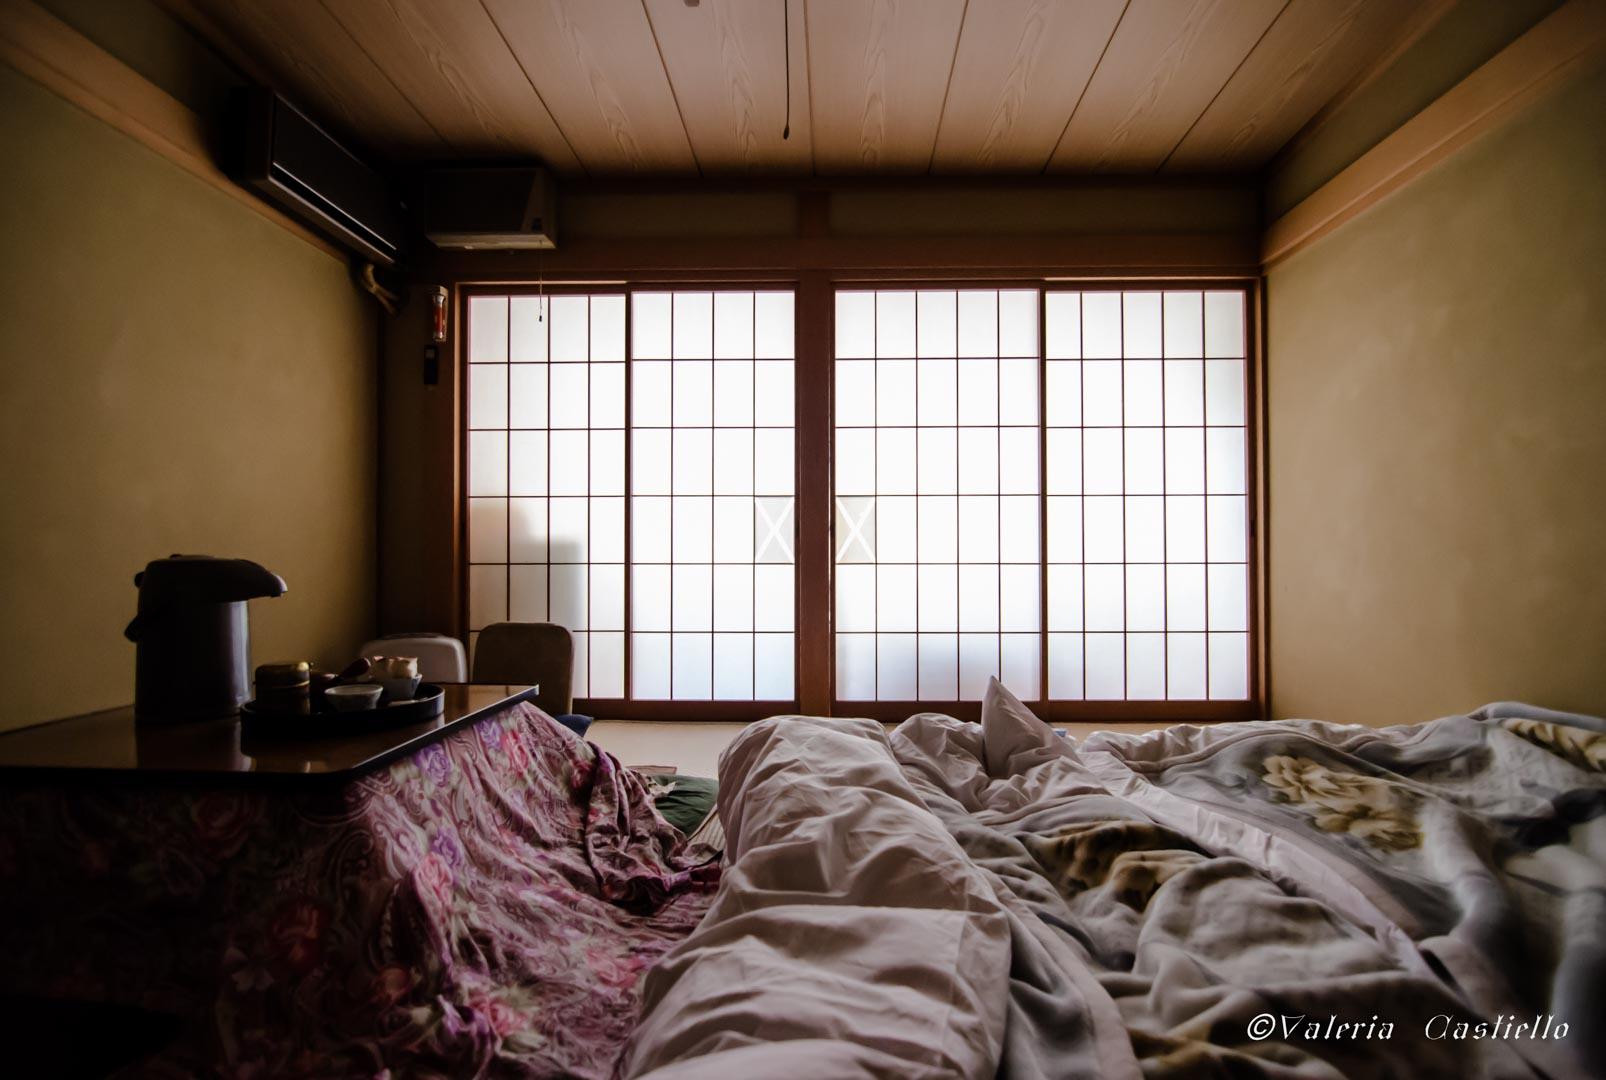 Yudanaka_Dormire in Giappone low cost_ Ryokan_-min